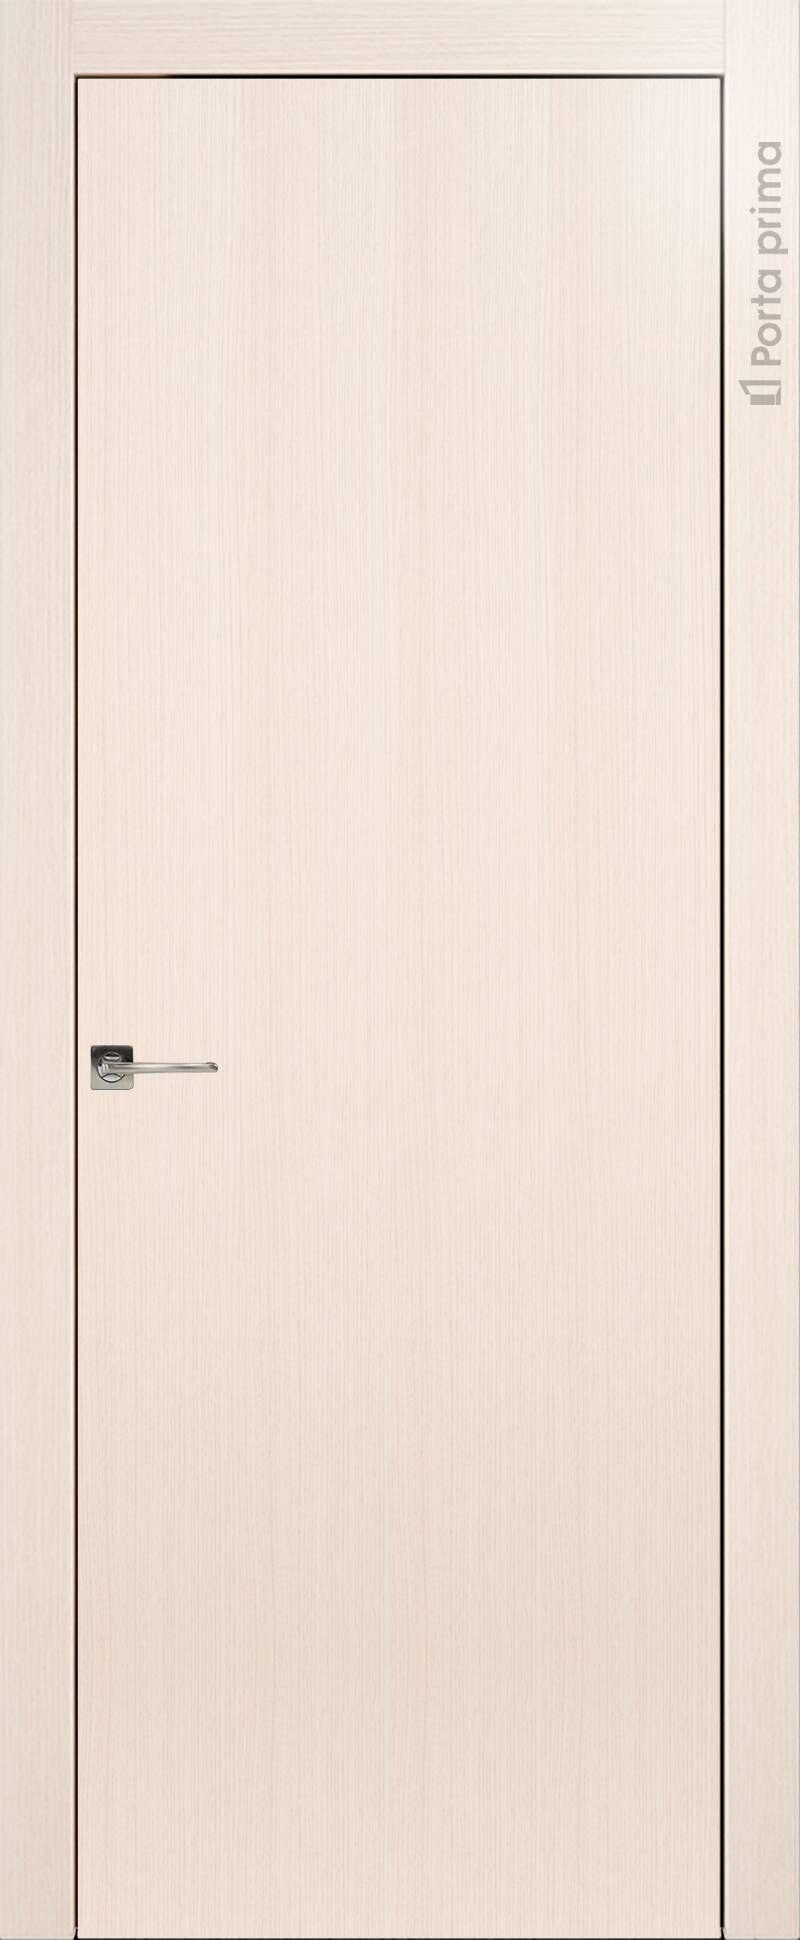 Tivoli А-1 цвет - Беленый дуб Без стекла (ДГ)